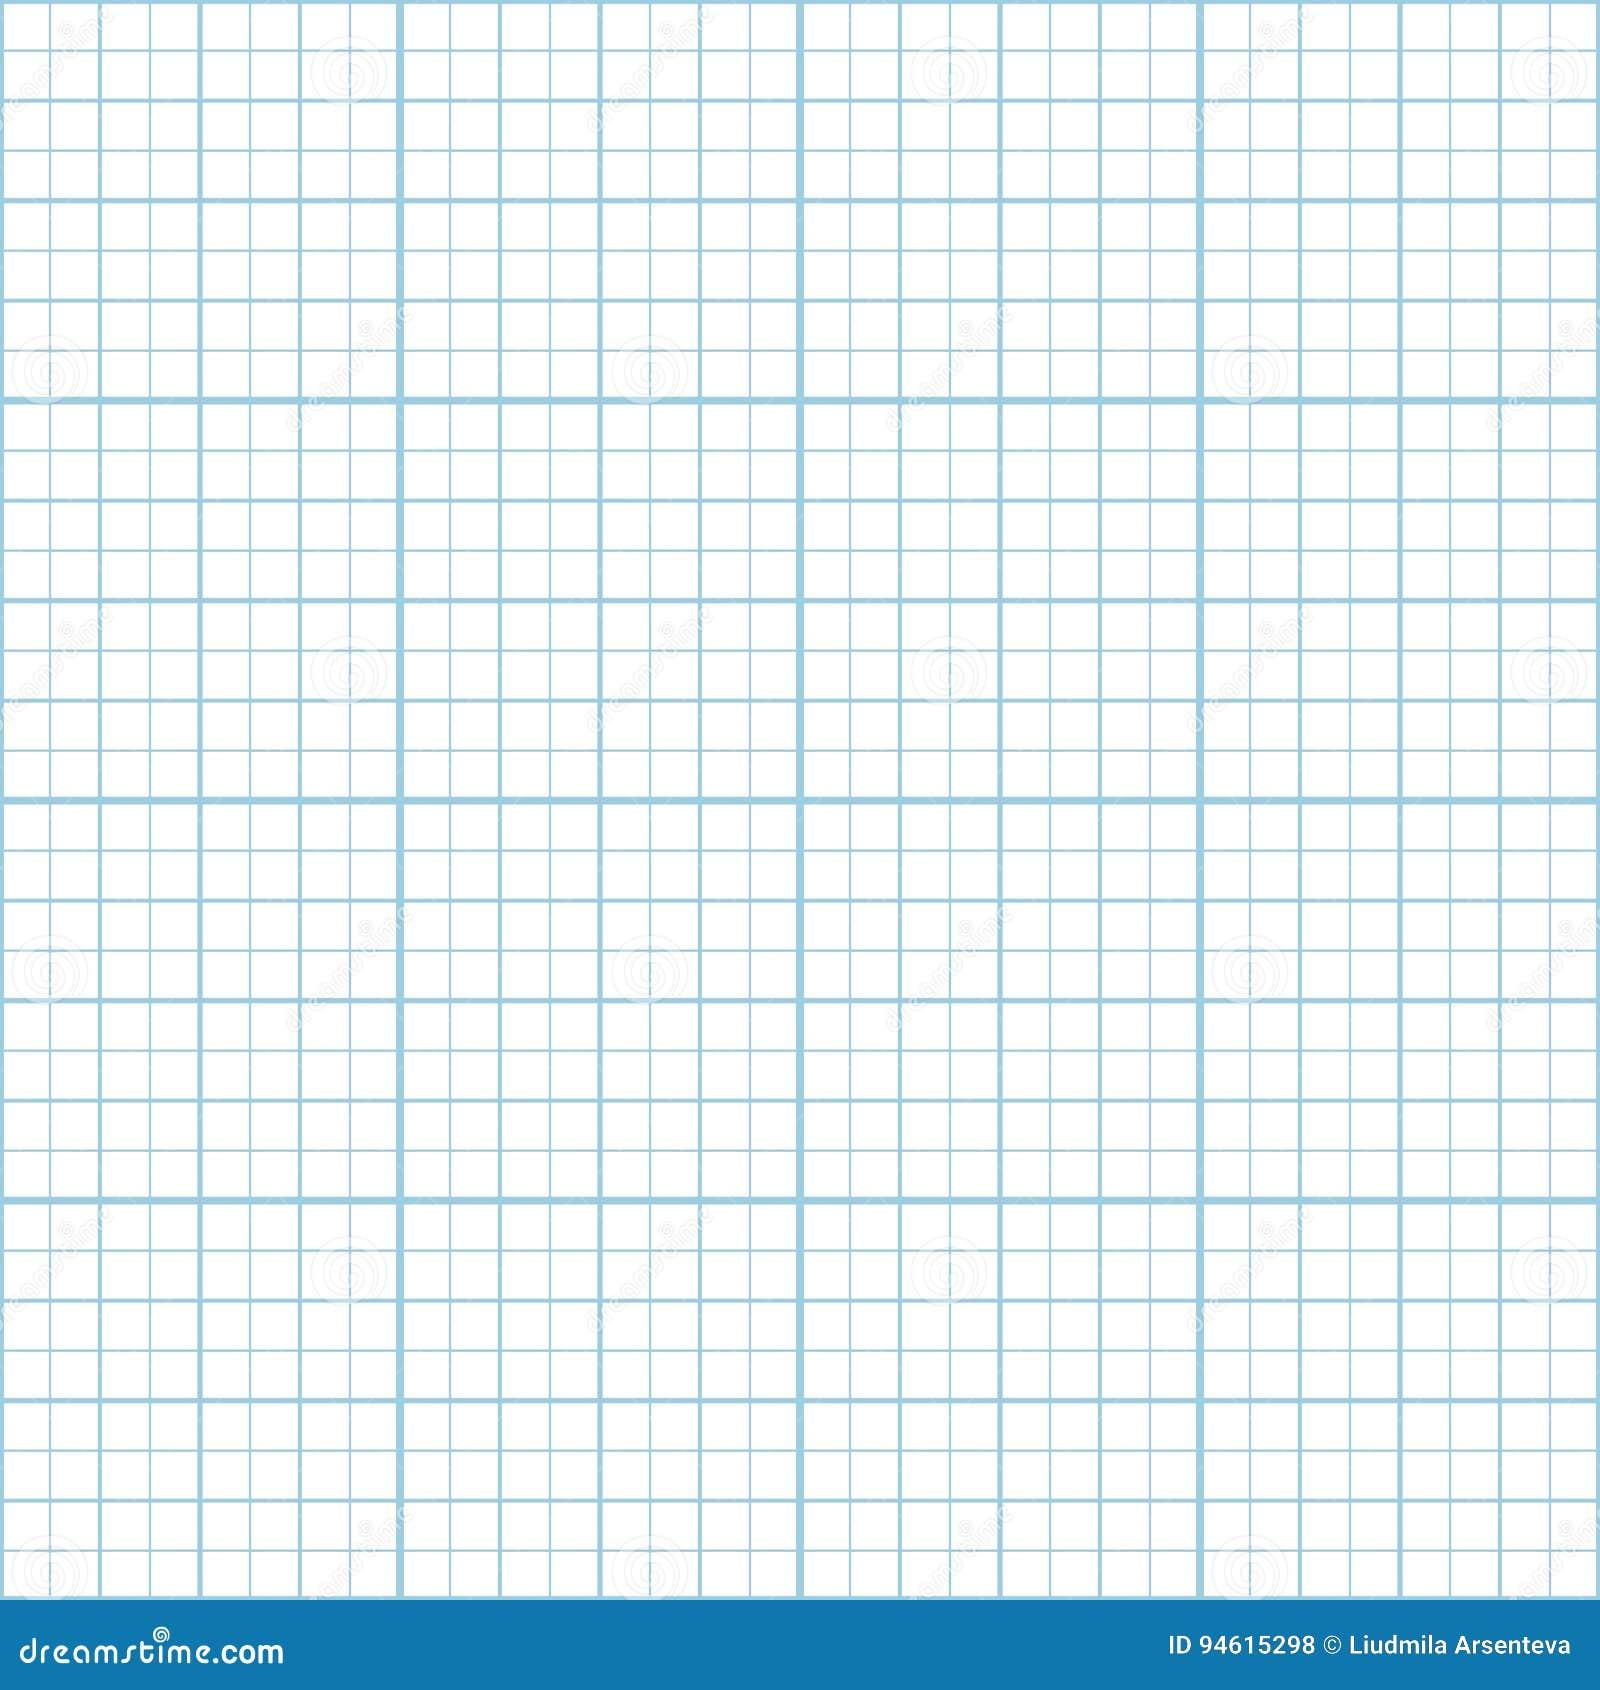 i inch grid paper